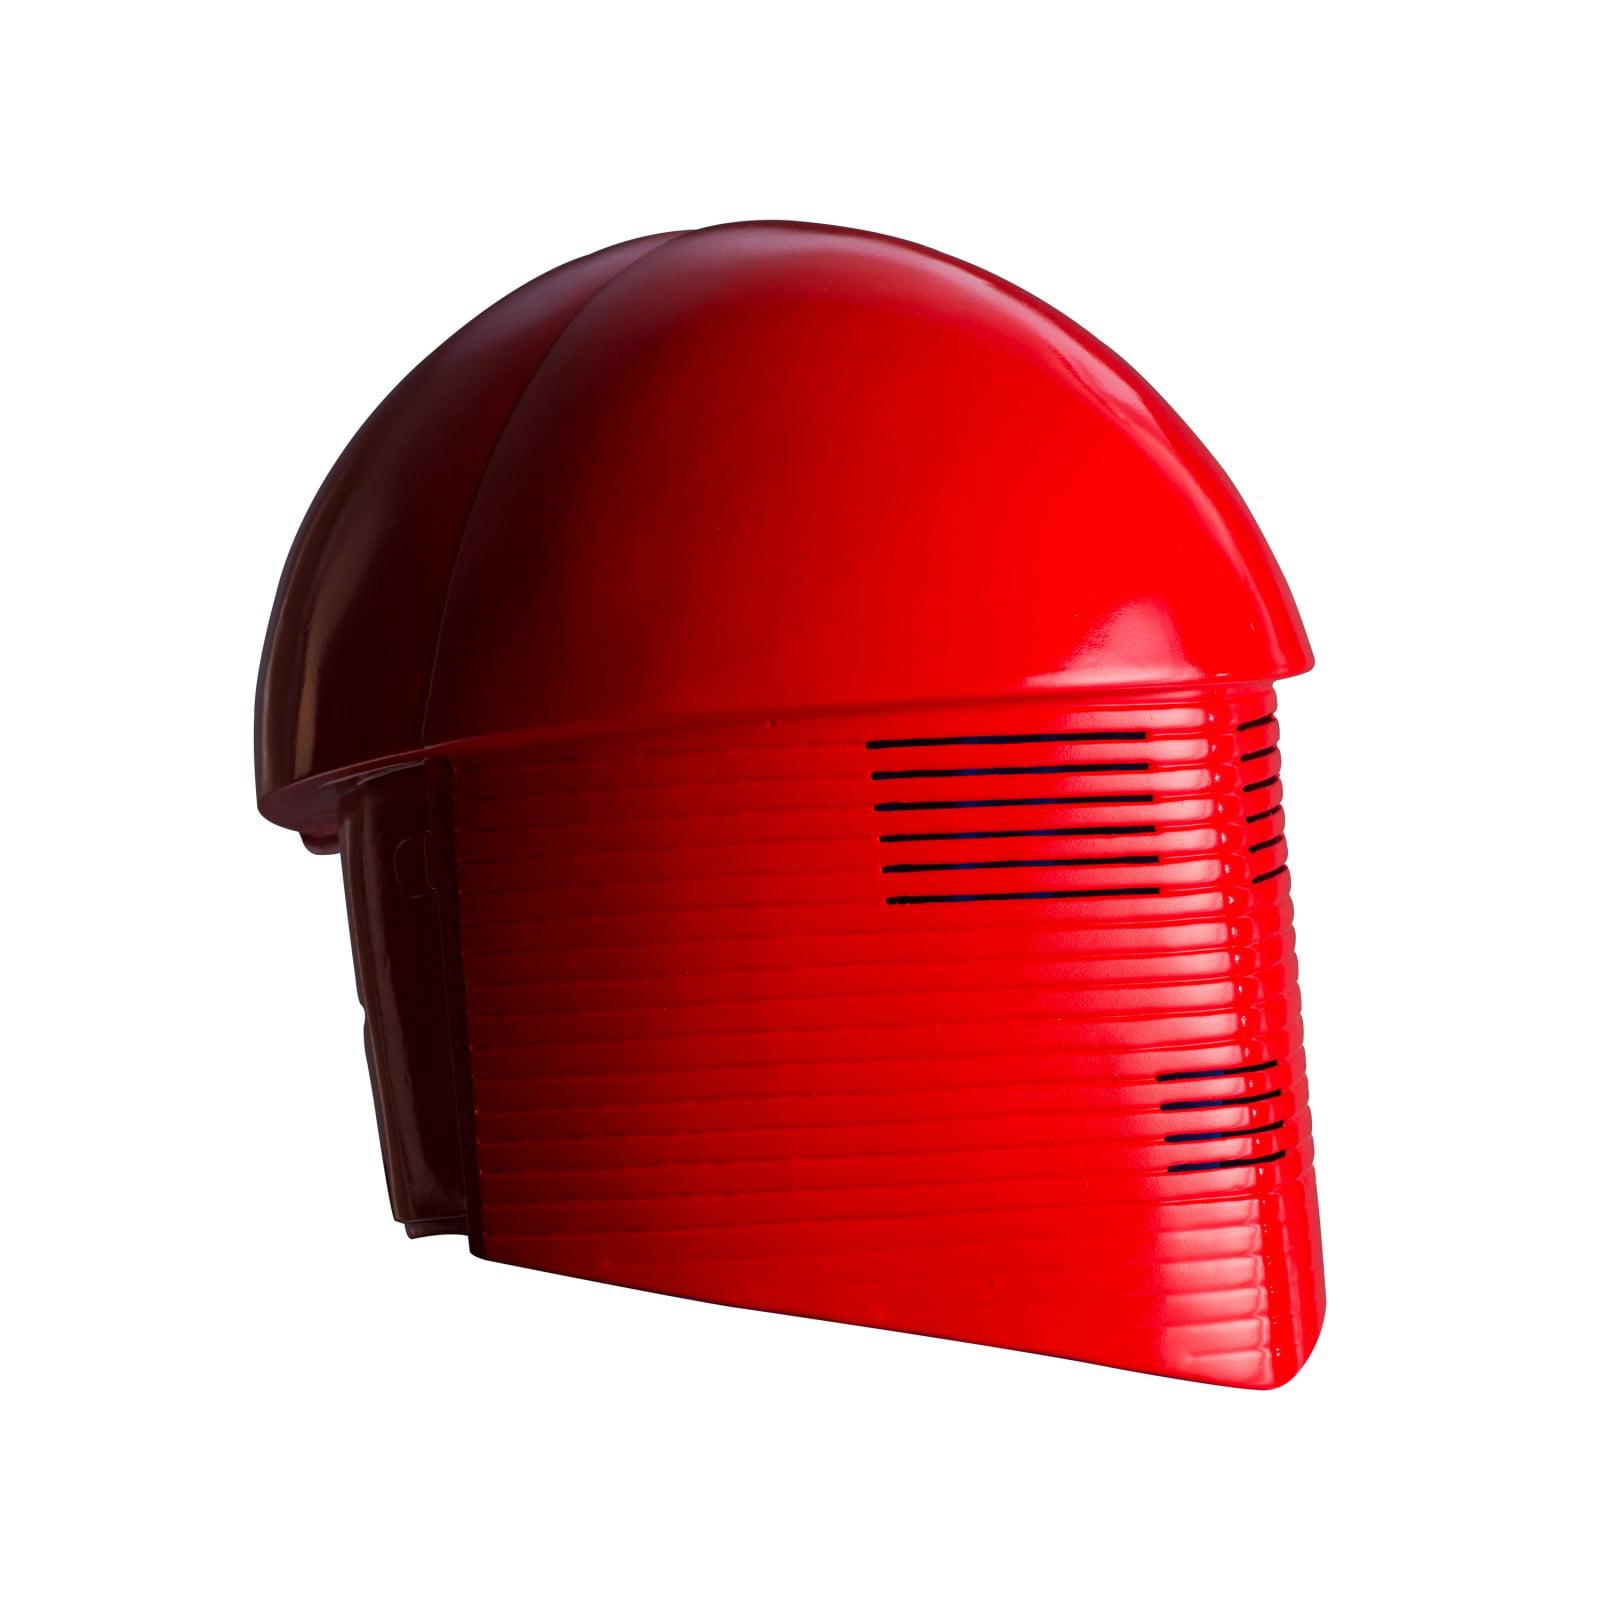 Star Wars Episode VIII - The Last Jedi Adult Deluxe Praetorian Guard Two-Piece Mask